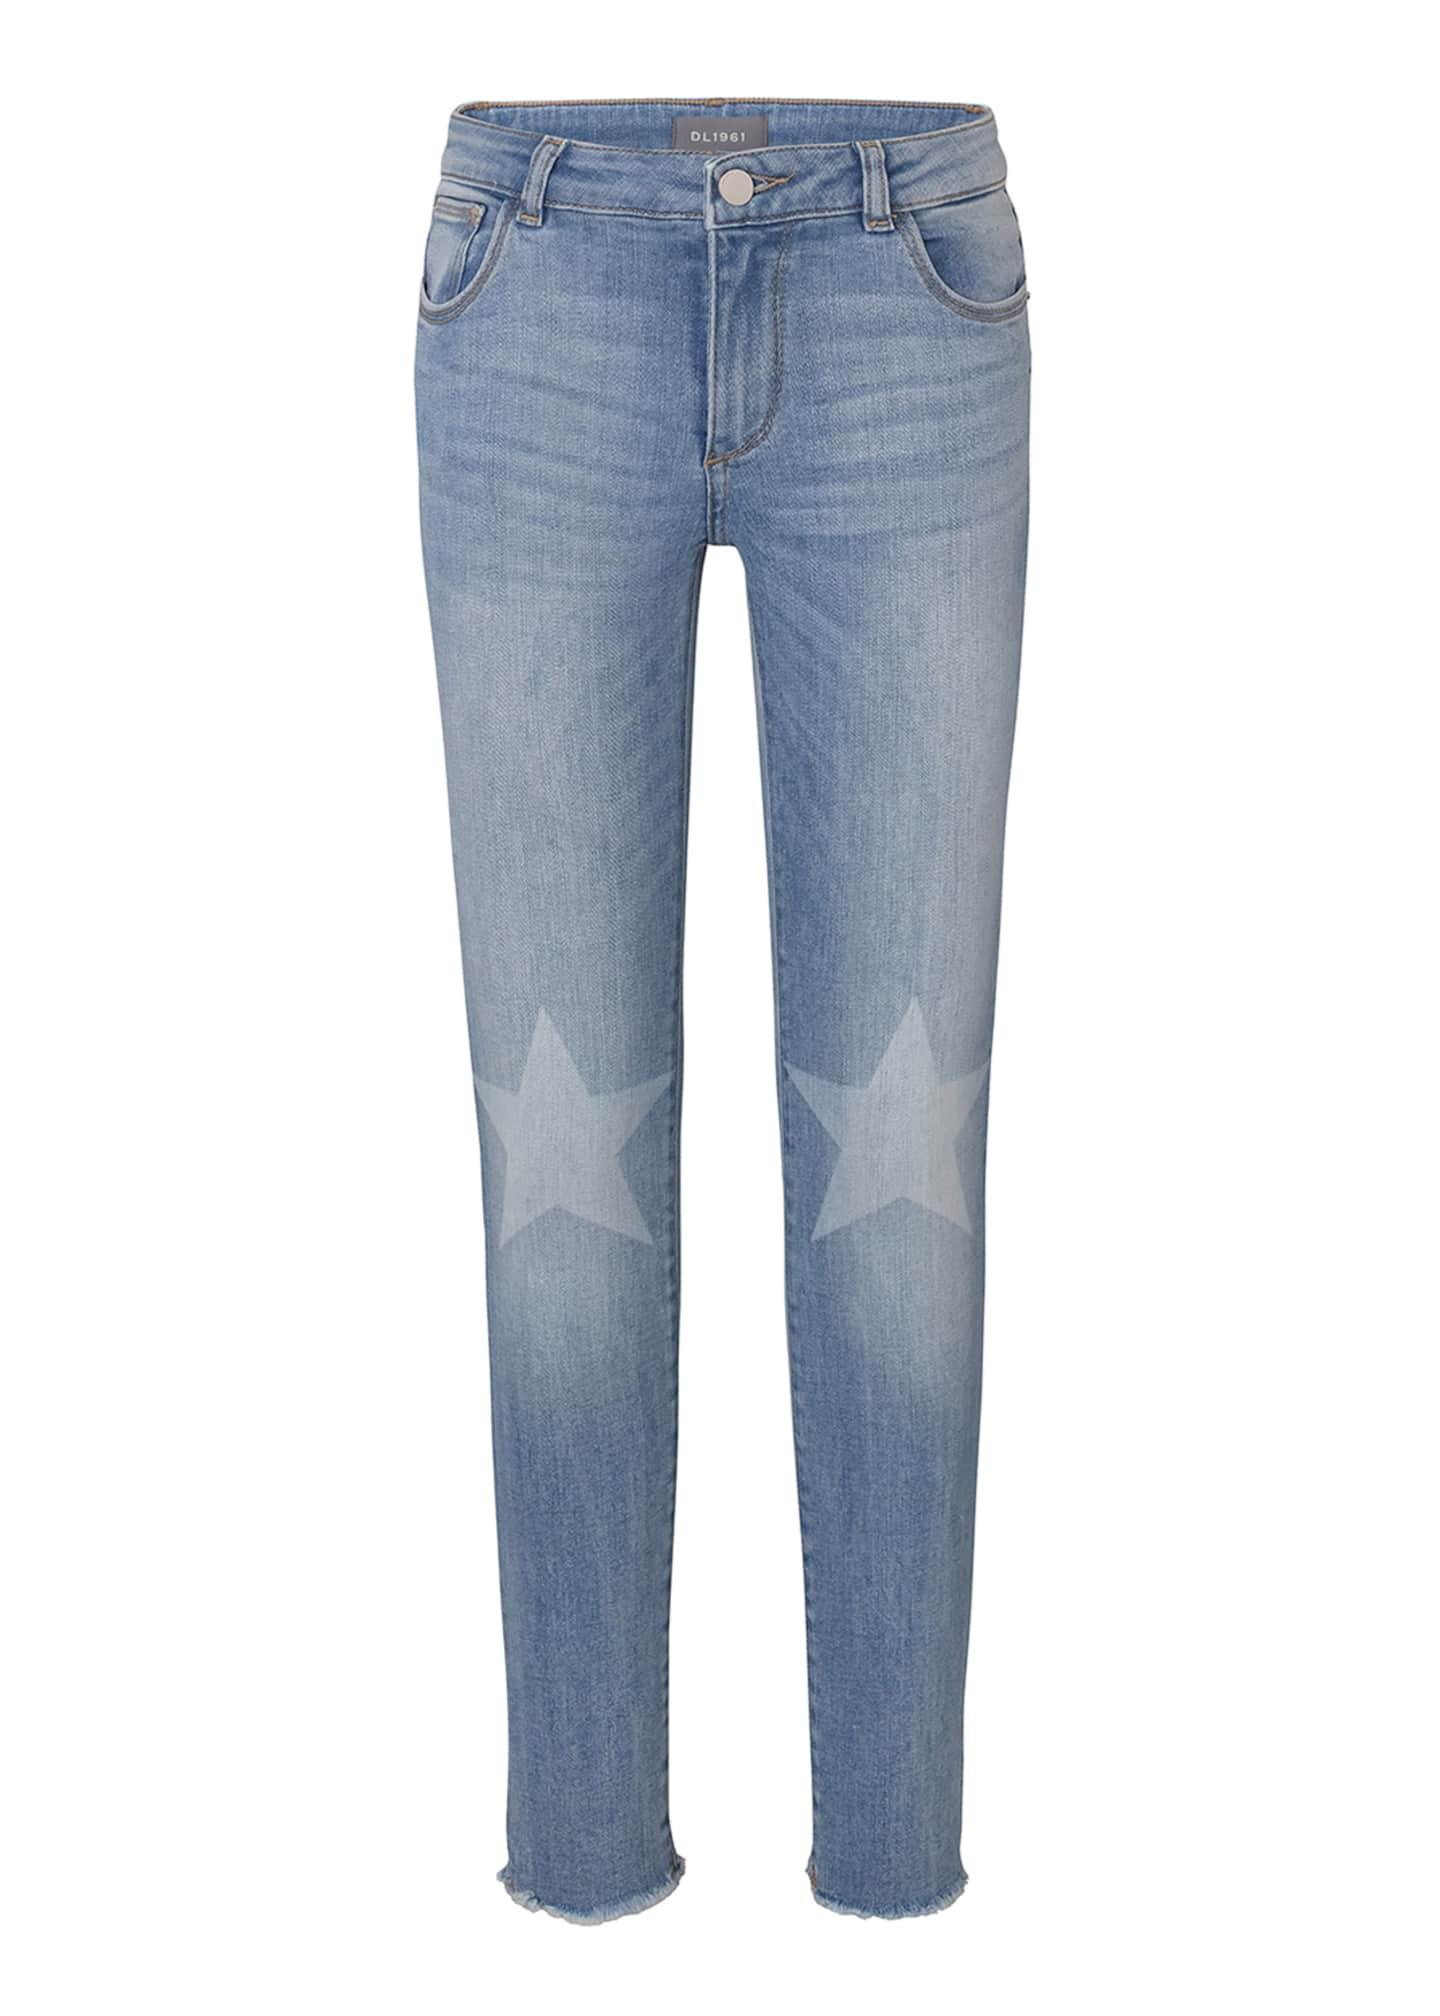 DL 1961 Chloe Skinny Jeans w/ Contrast Knee